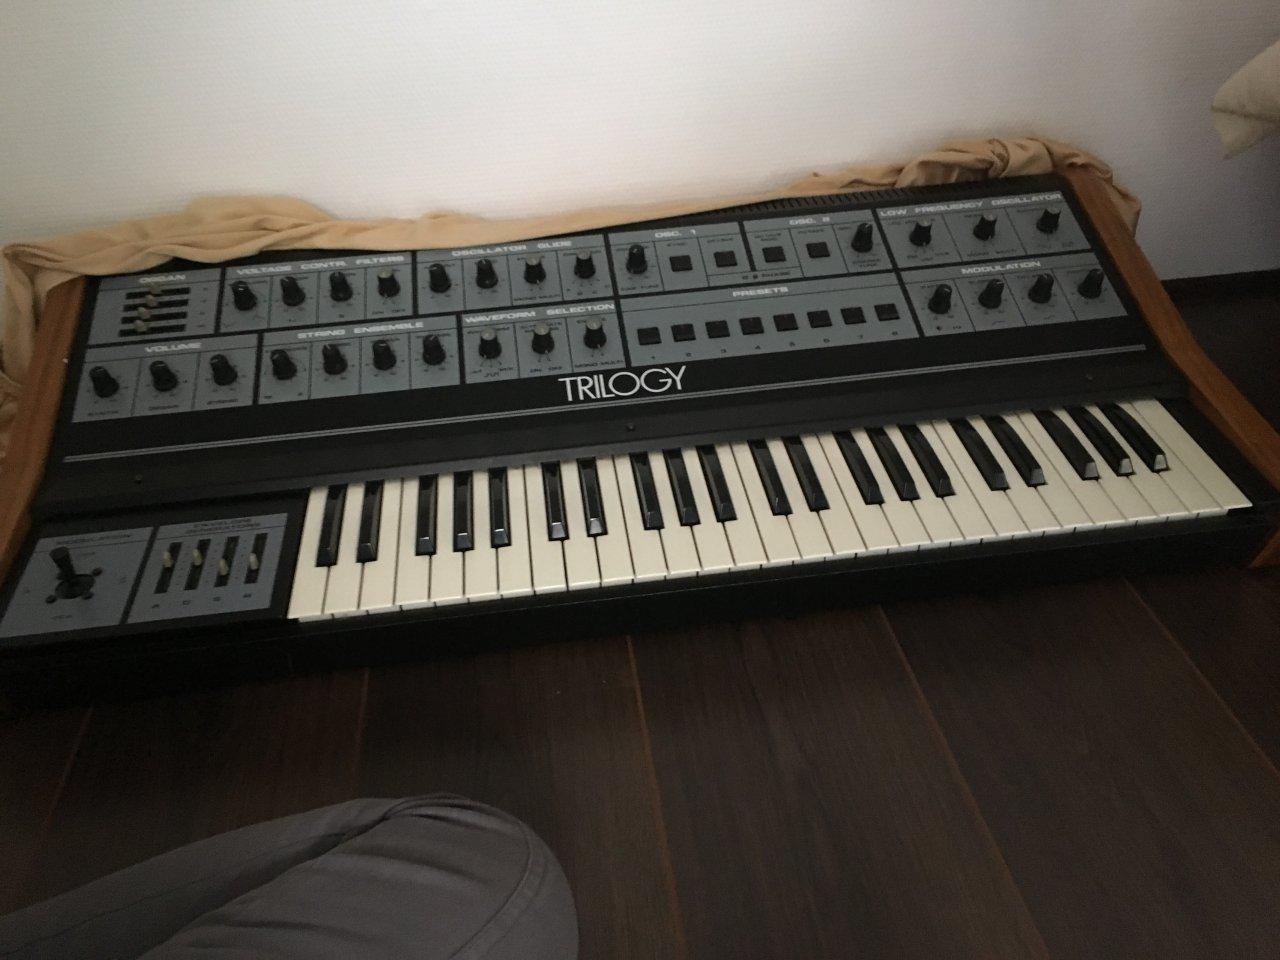 crumar trilogy wo berholen lassen musiker board. Black Bedroom Furniture Sets. Home Design Ideas